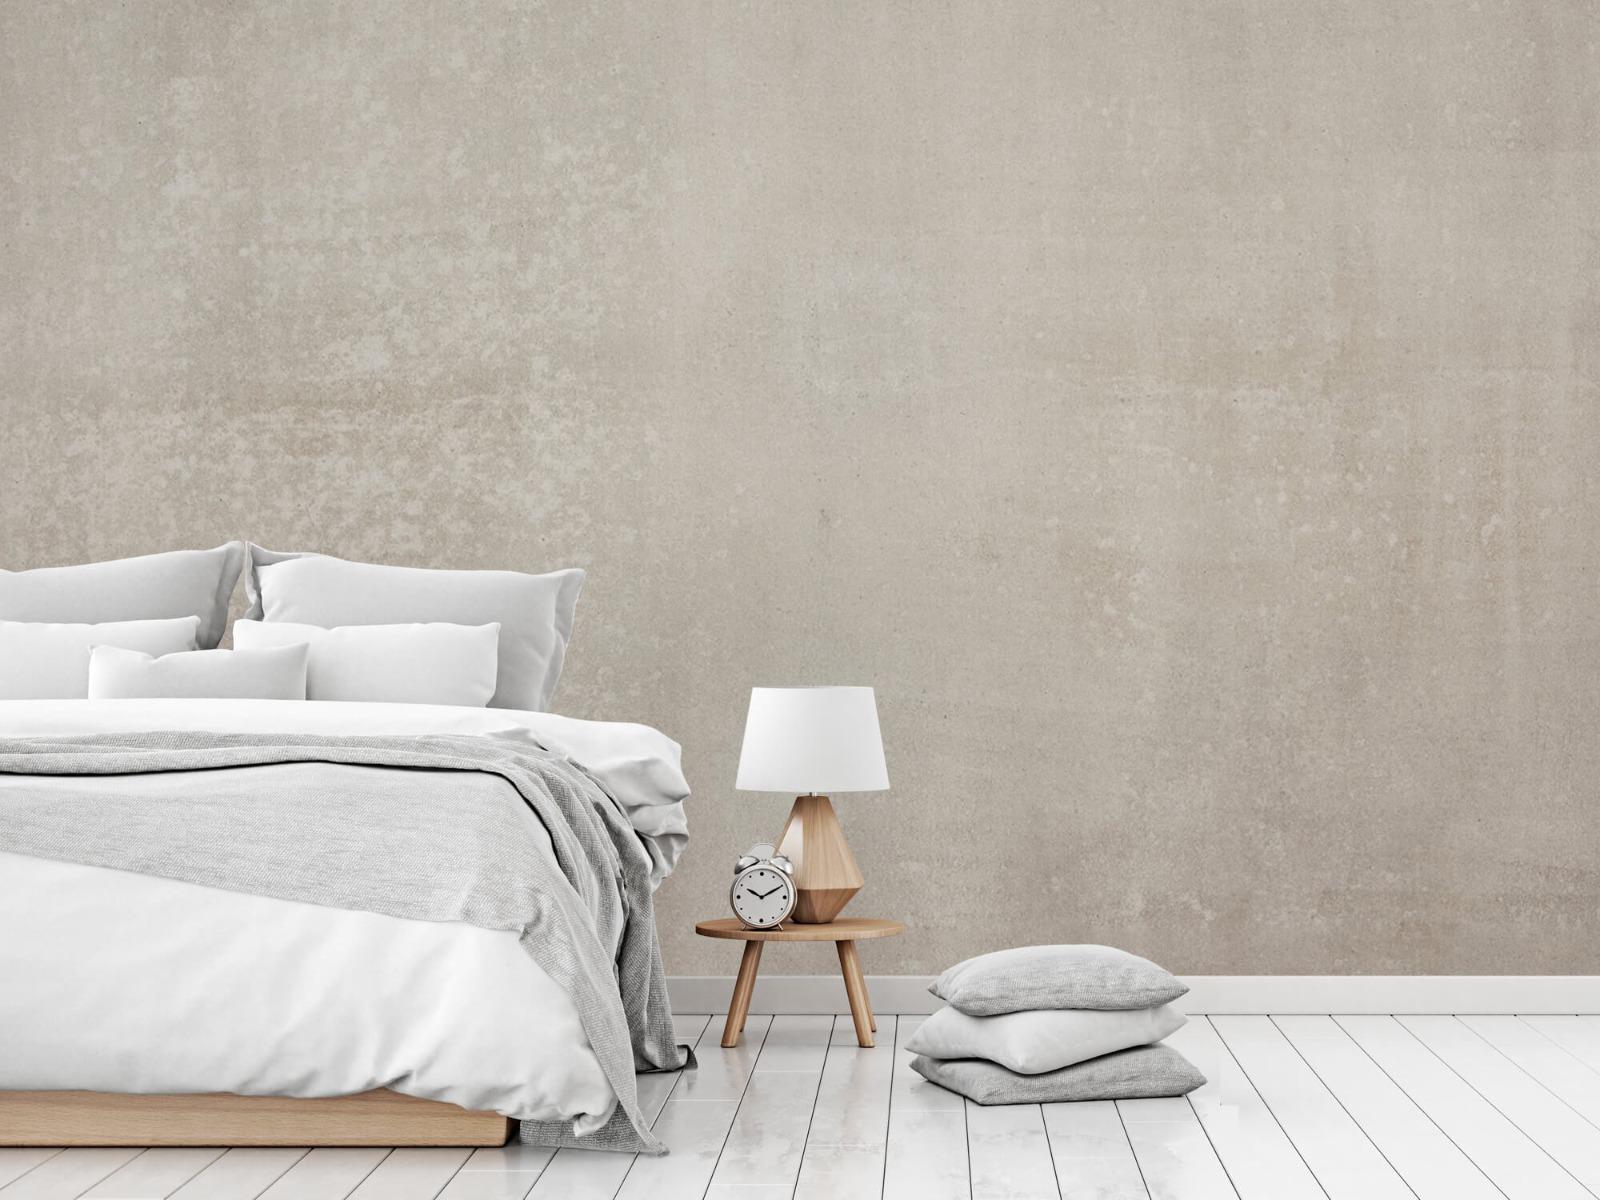 Betonlook behang - Taupe beton - Wallexclusive - Woonkamer 15